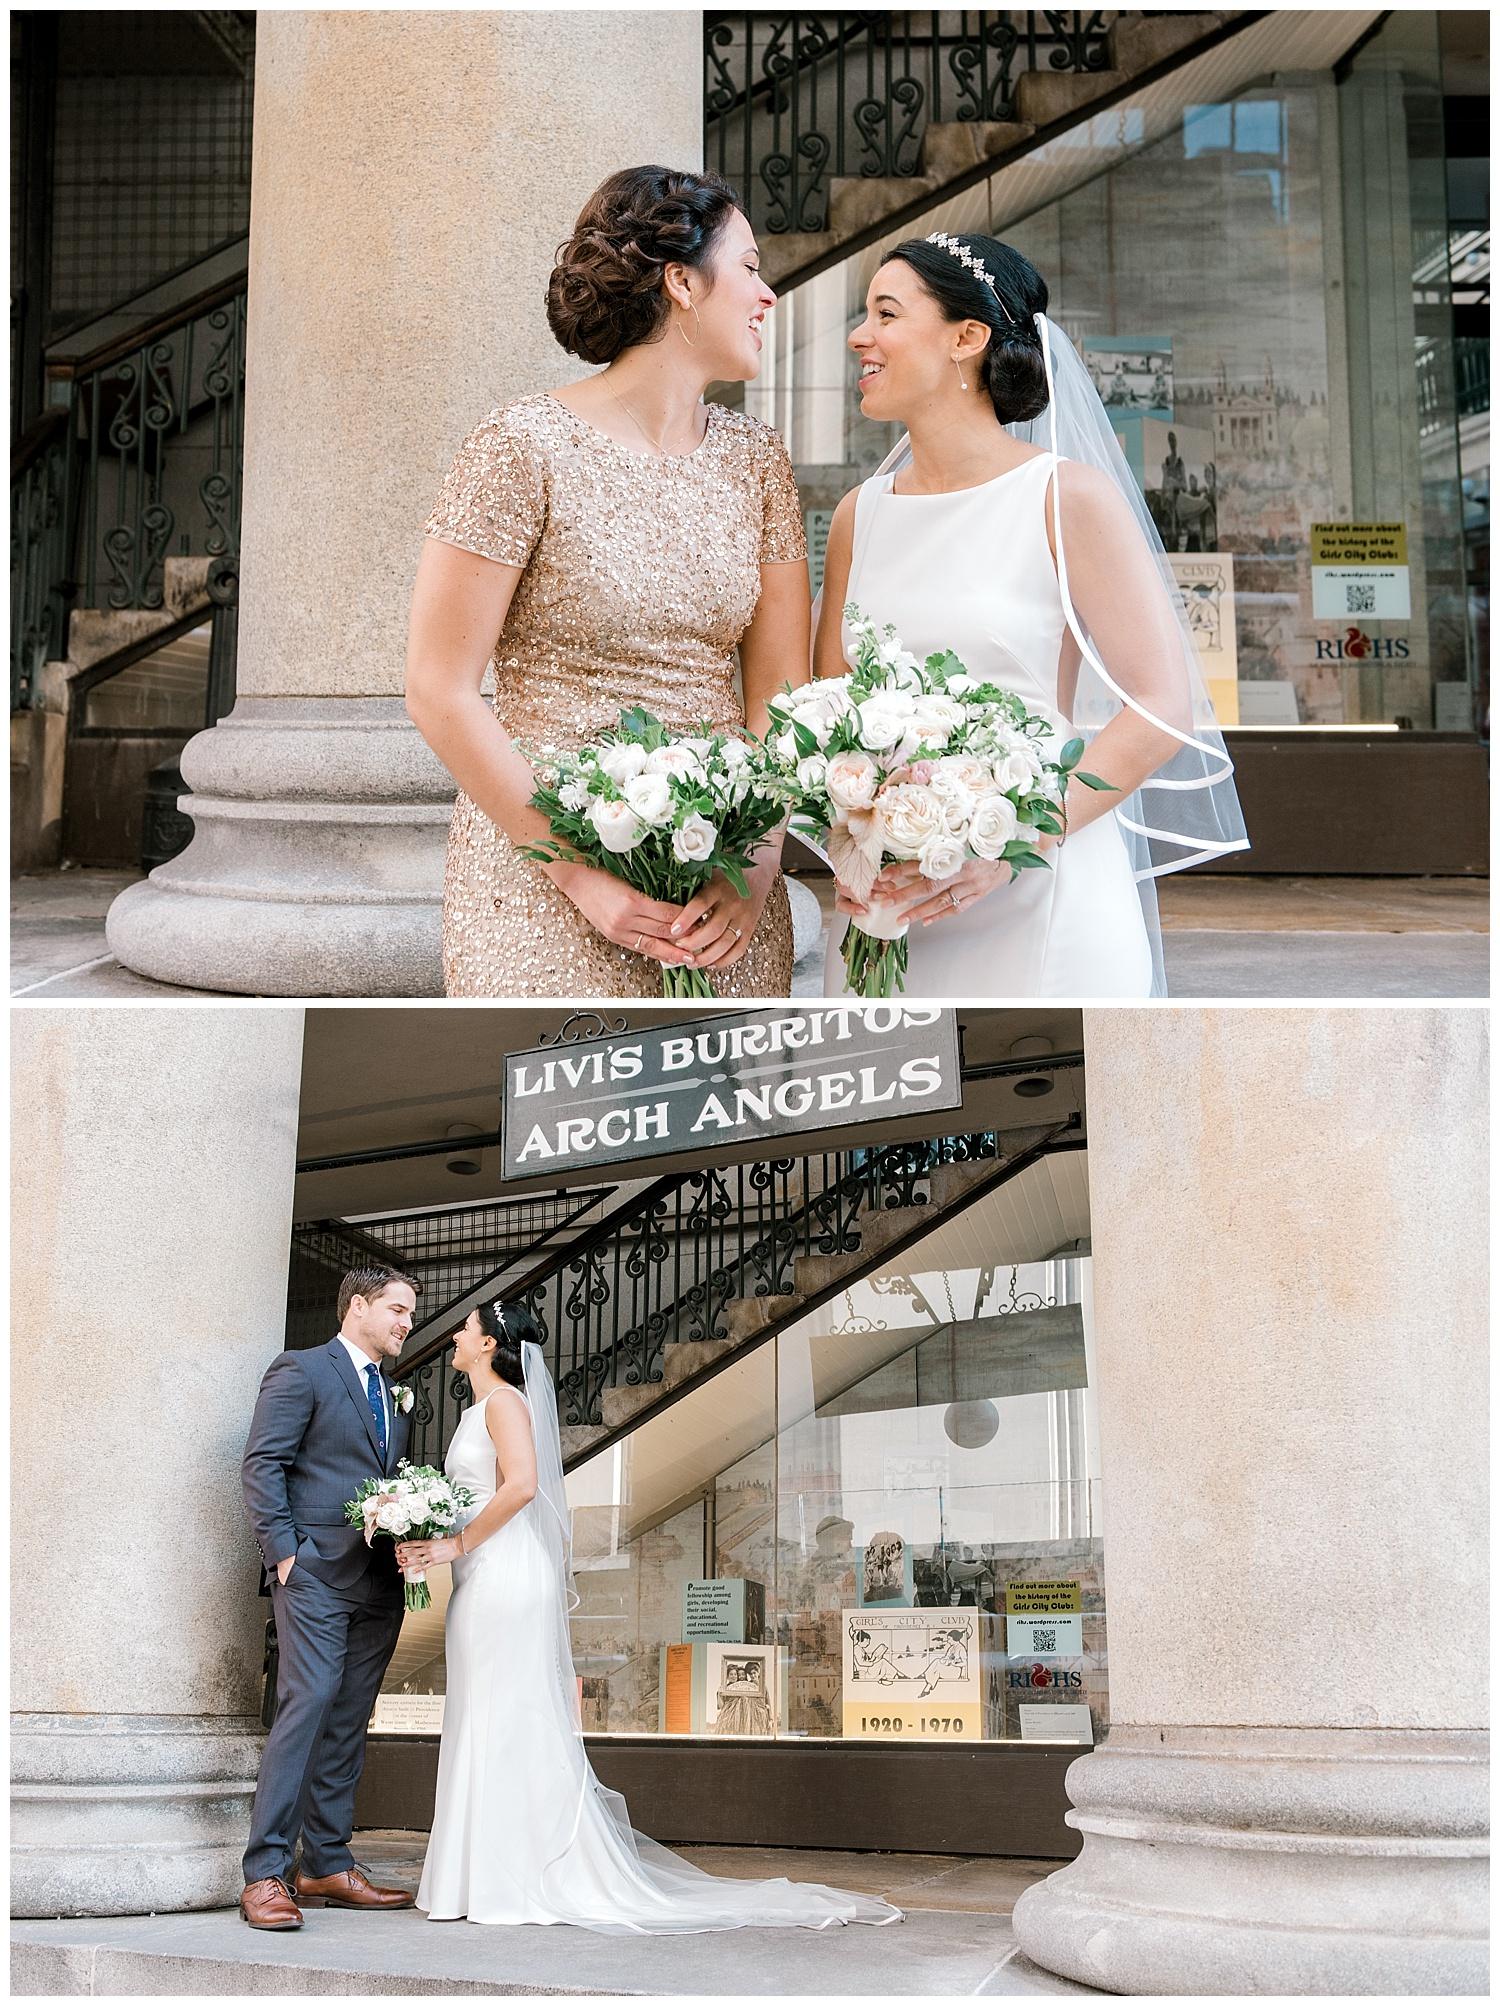 the-dorrance-providence-wedding-photography-october19-photo-7.jpg